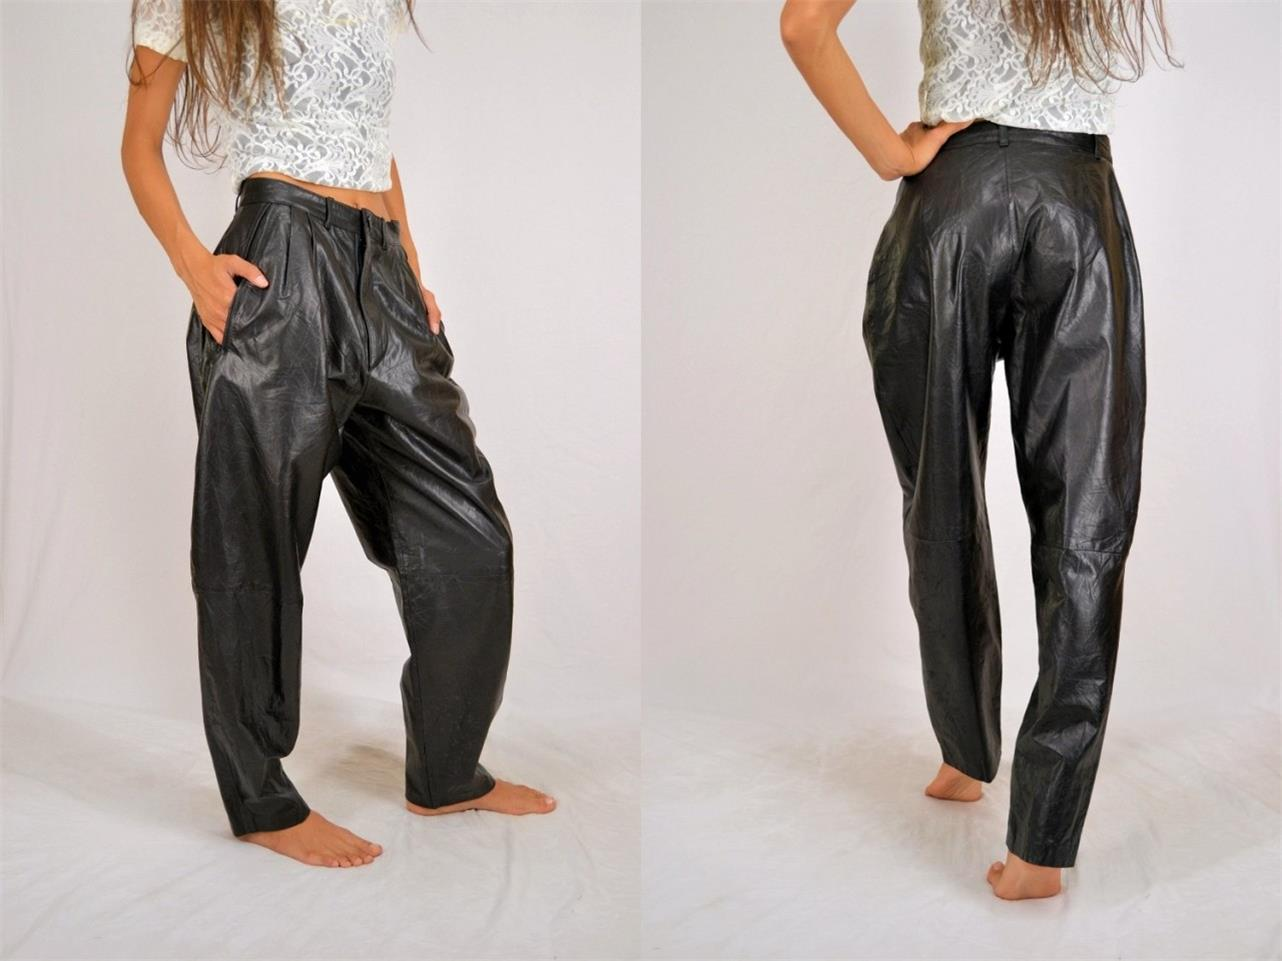 Vintage black pleated puffy lambskin soft leather diva rocker pants xs waist 28 ebay - Diva pants ebay ...